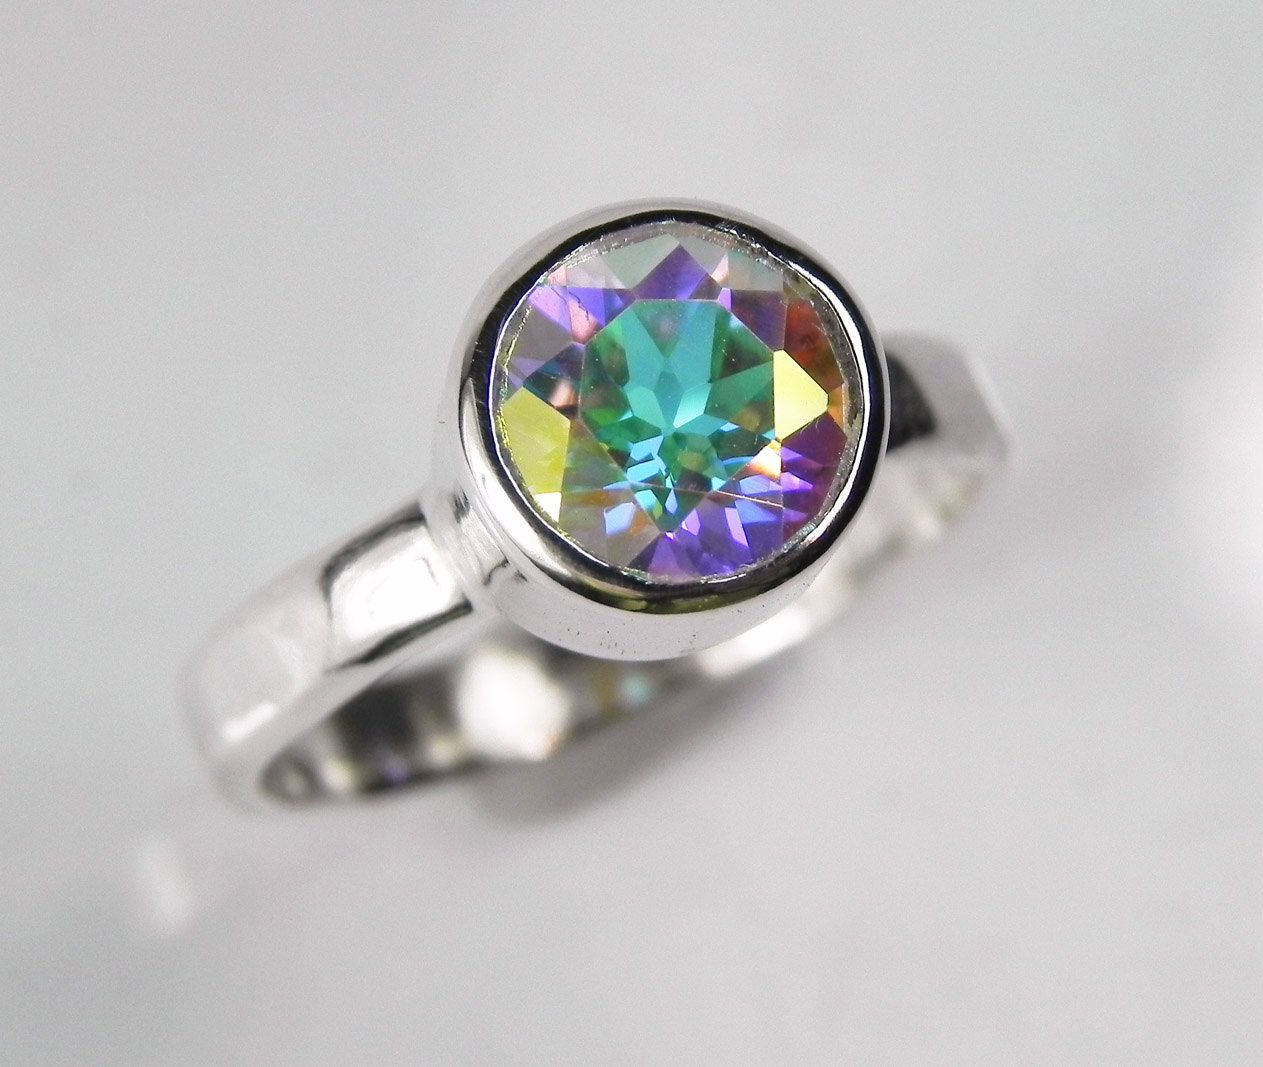 mystic topaz engagement ring unique alternative wedding. Black Bedroom Furniture Sets. Home Design Ideas